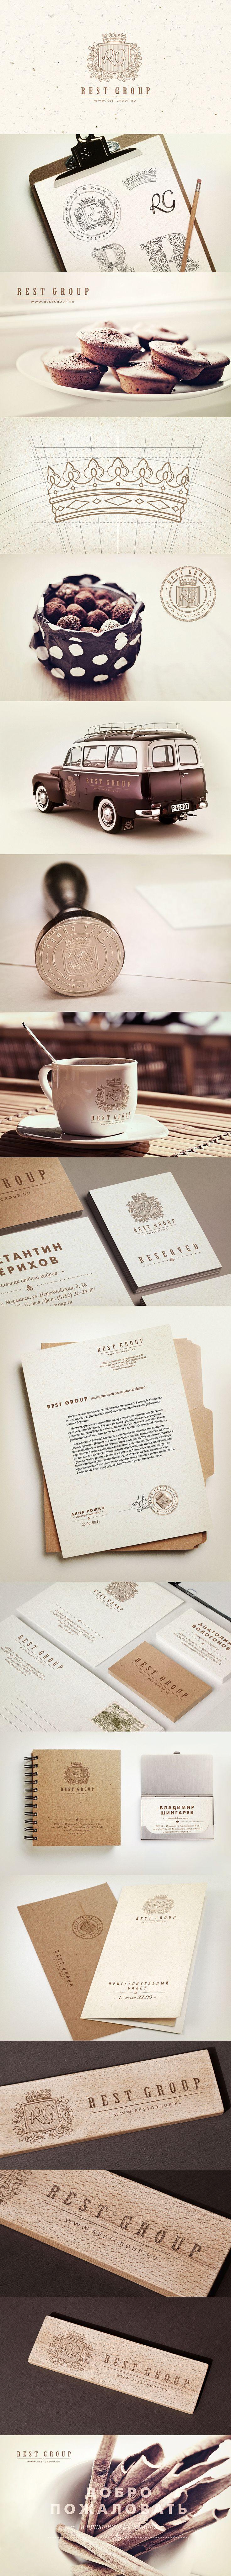 Rest Group, Identity © Павел Емельянов #design #corporate #identity #branding #visual